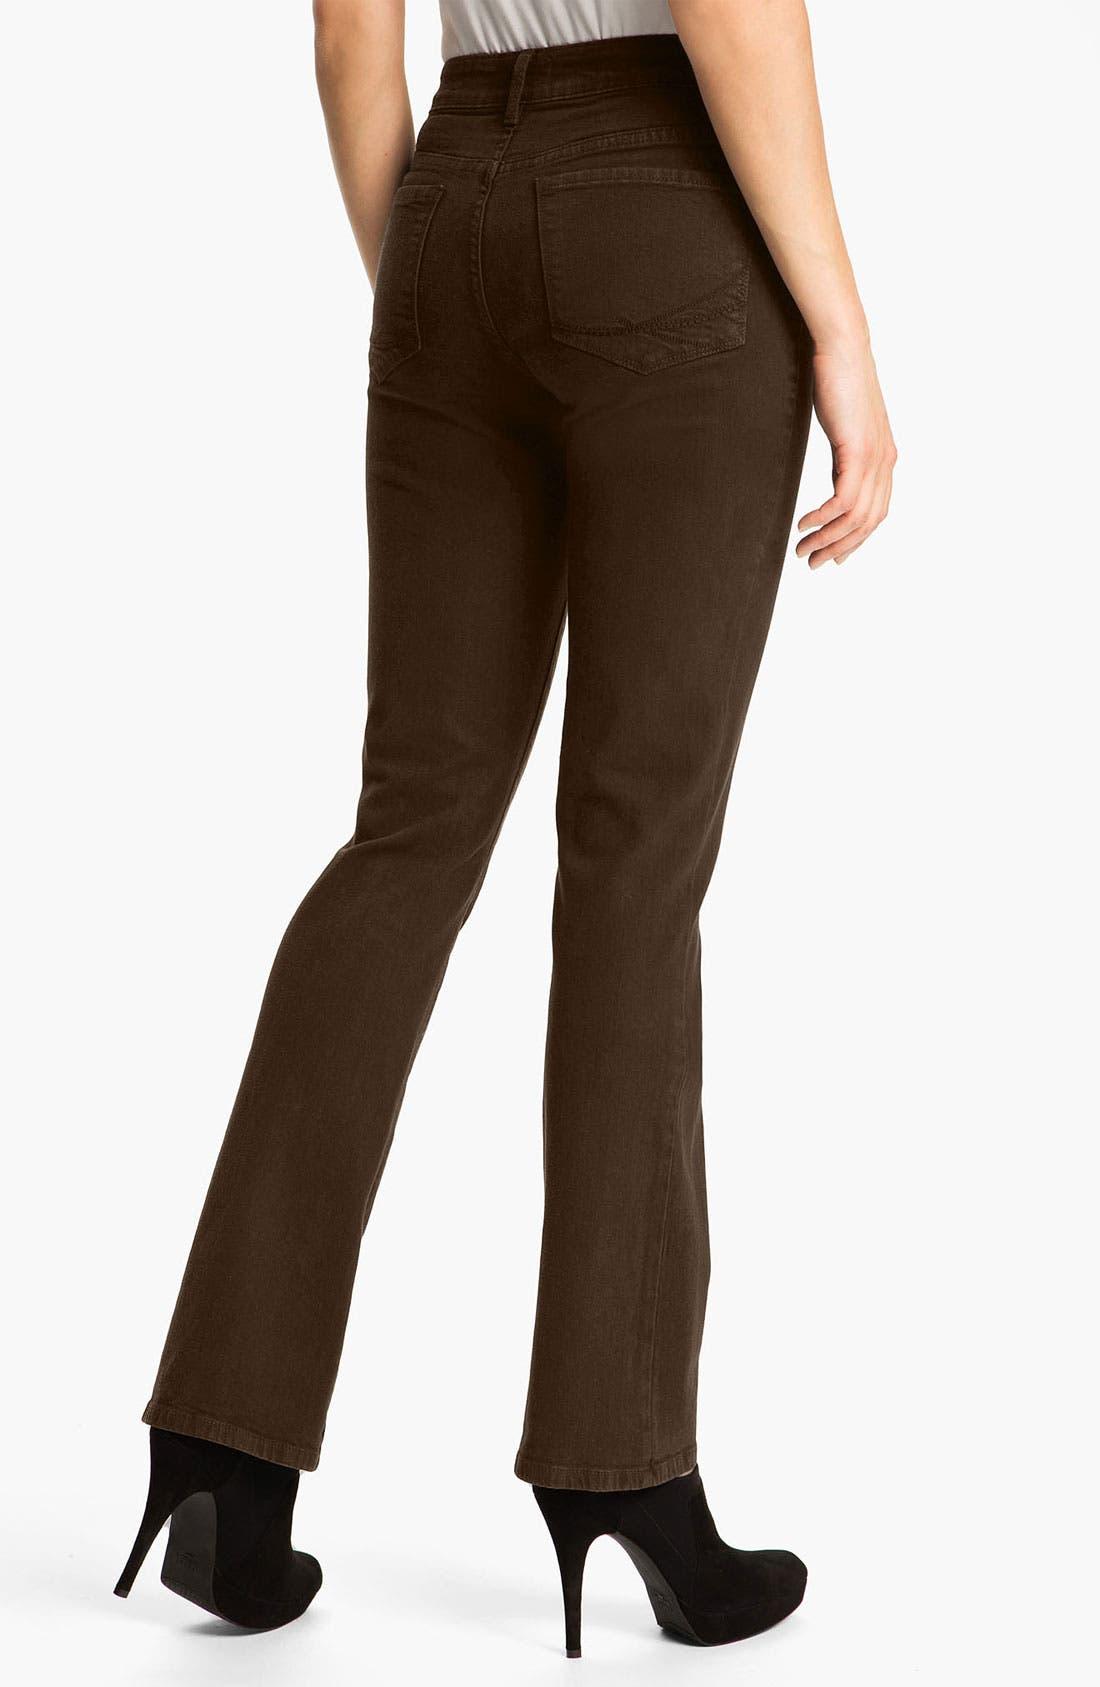 Alternate Image 2  - NYDJ 'Barbara' Colored Denim Bootcut Jeans (Petite)